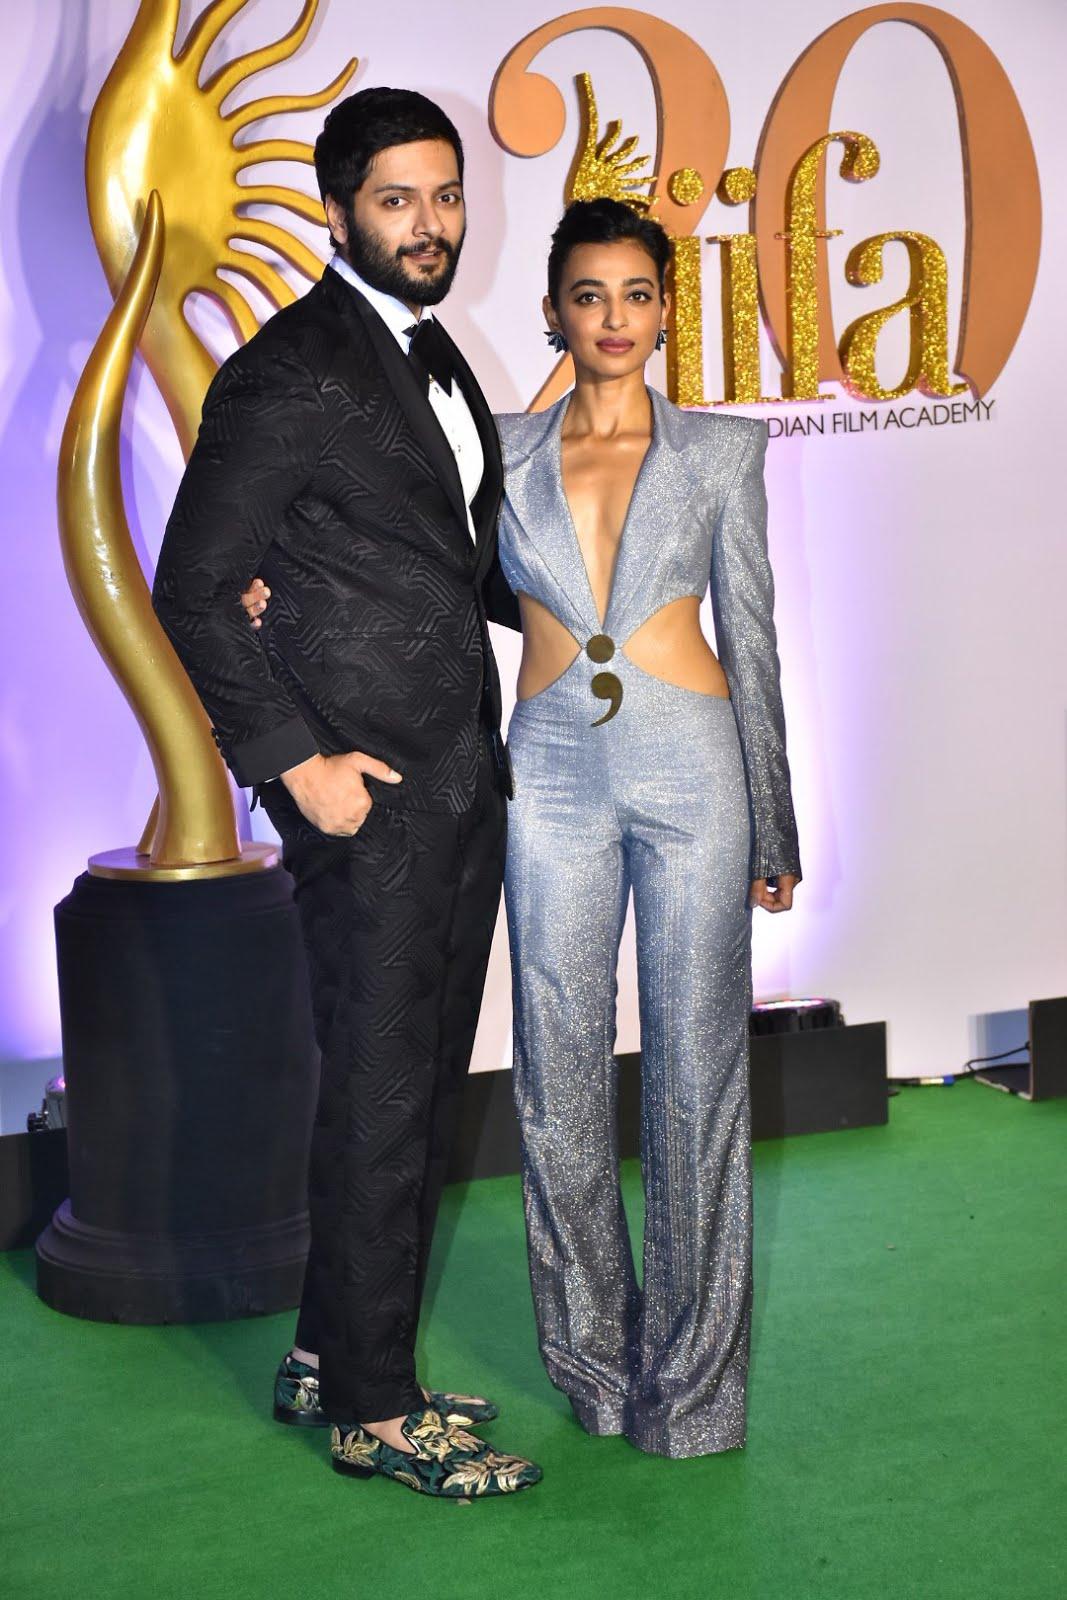 IIFA Awards 2019 Hindi 480p HDRip 600MB